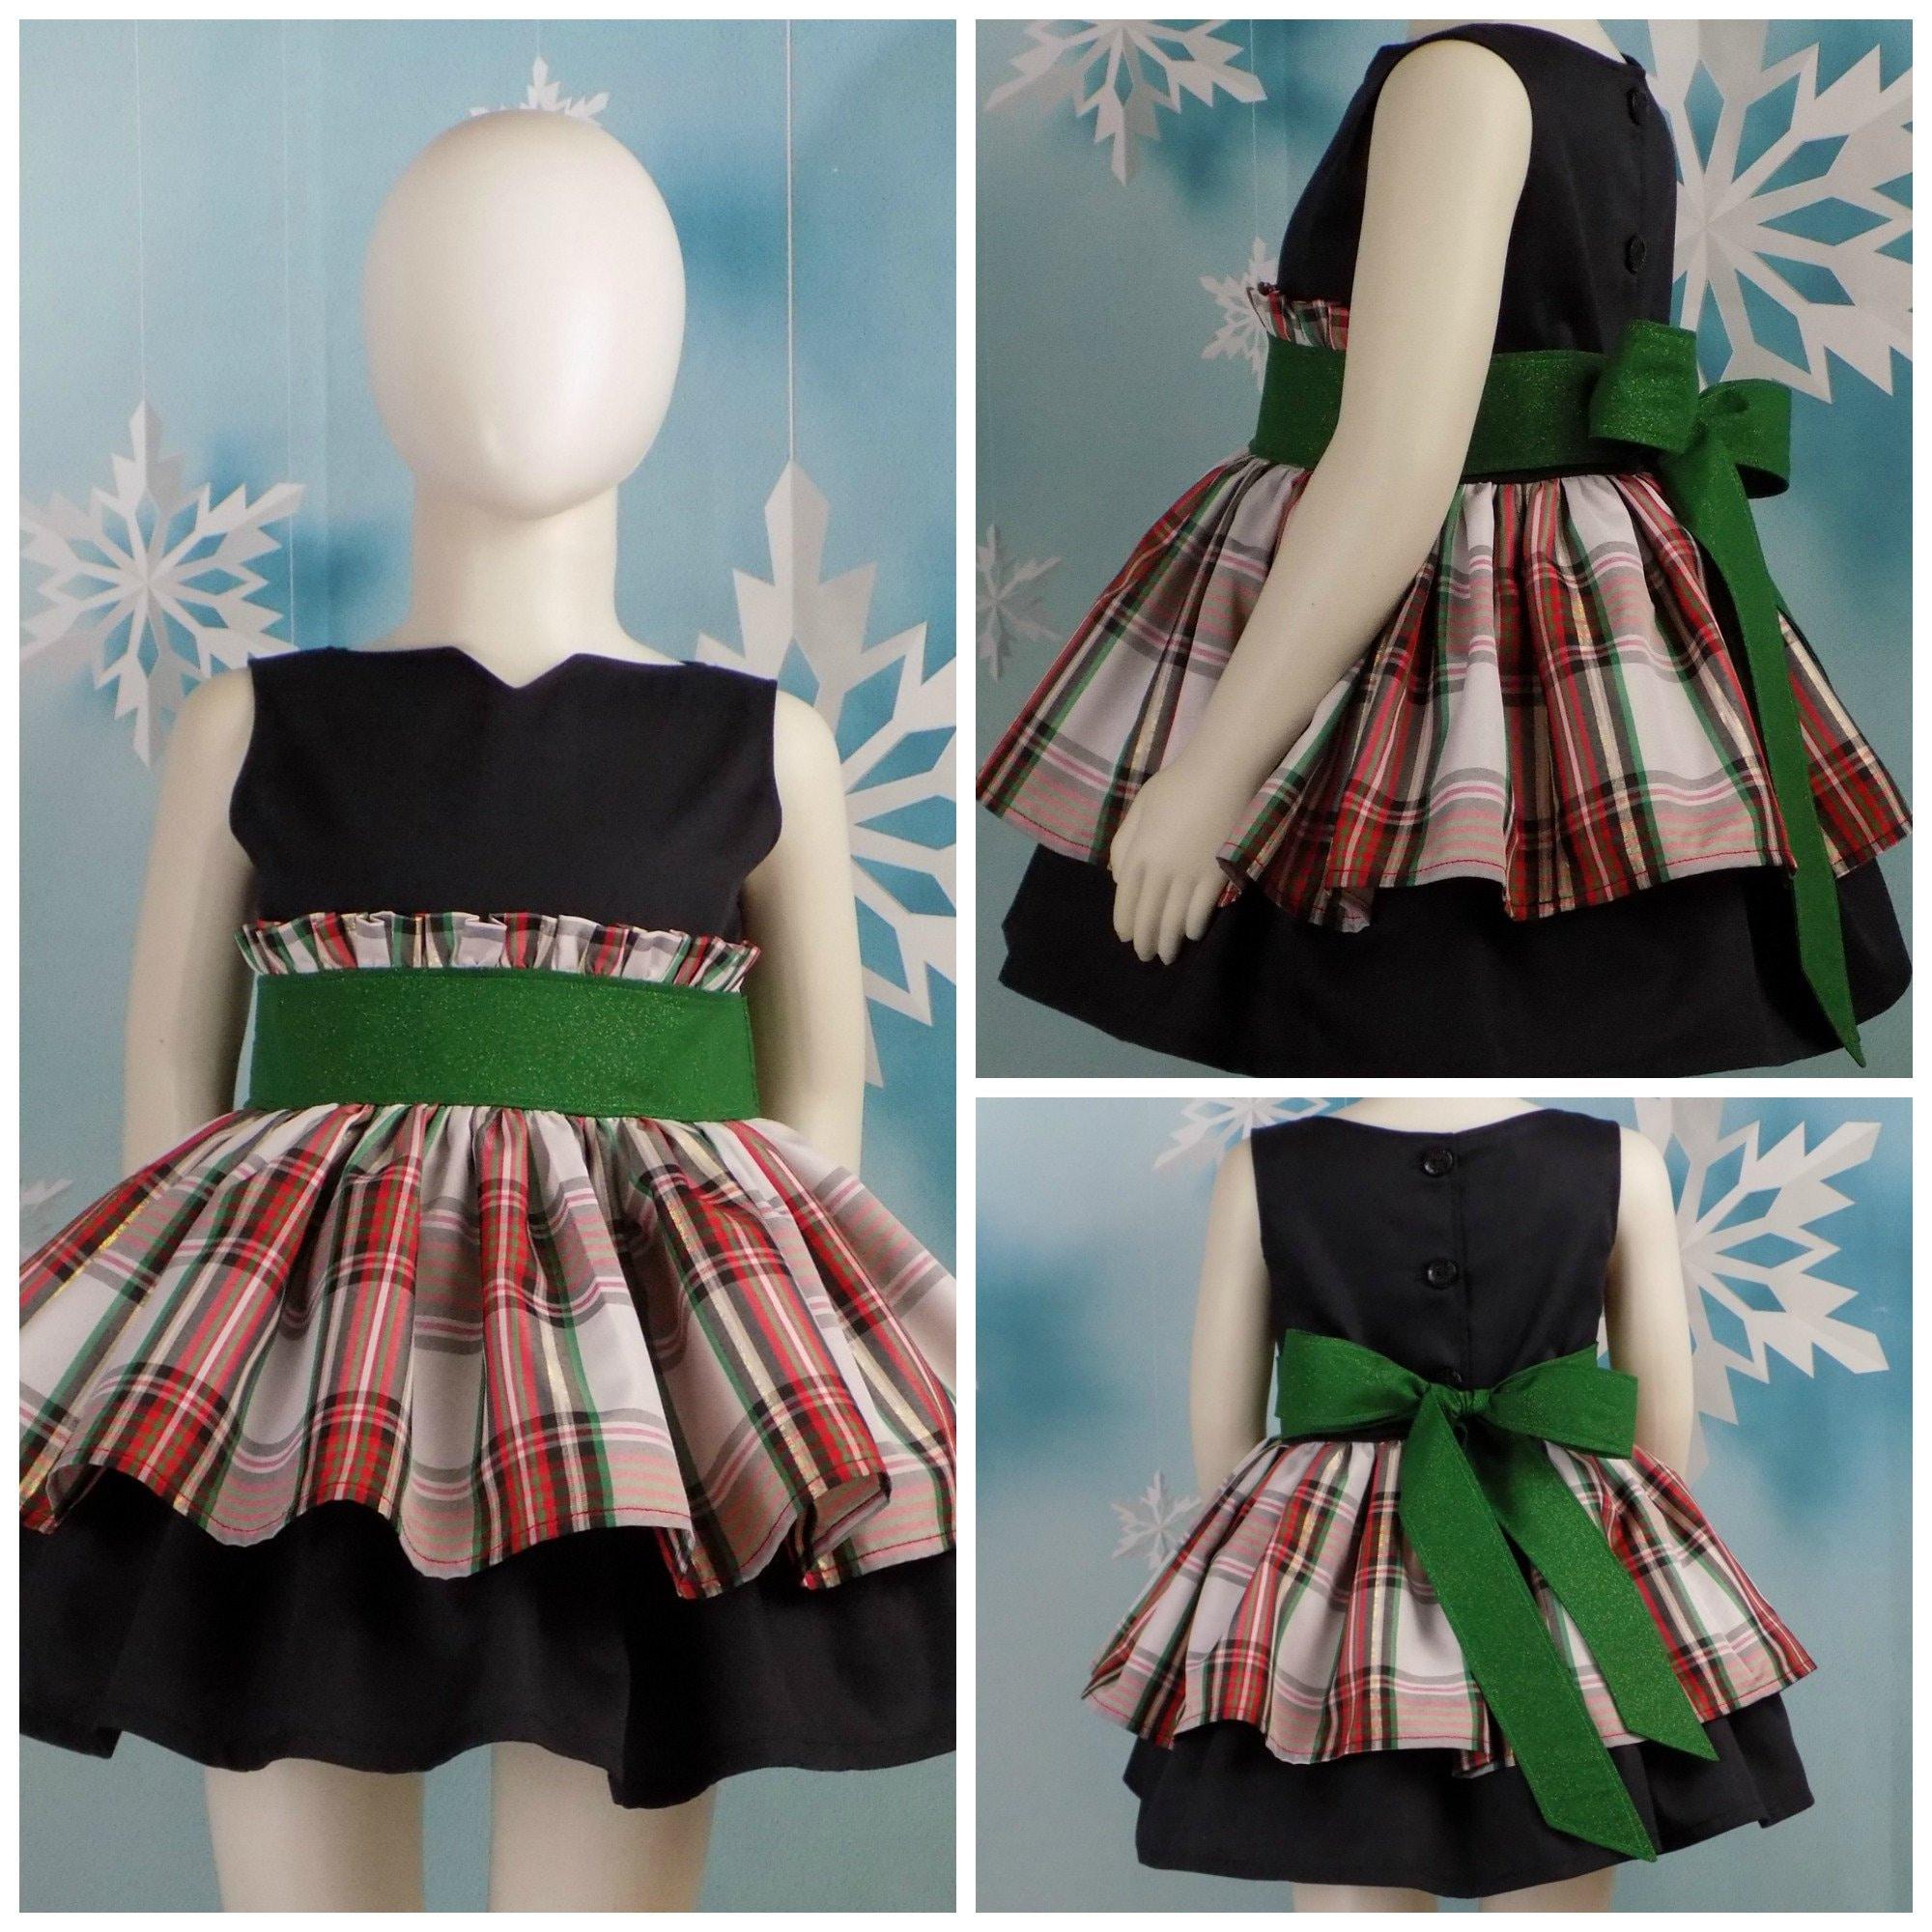 9c1fad95b5ab Girls Christmas Dress Plaid Holiday Pageant Wear OOC   Etsy